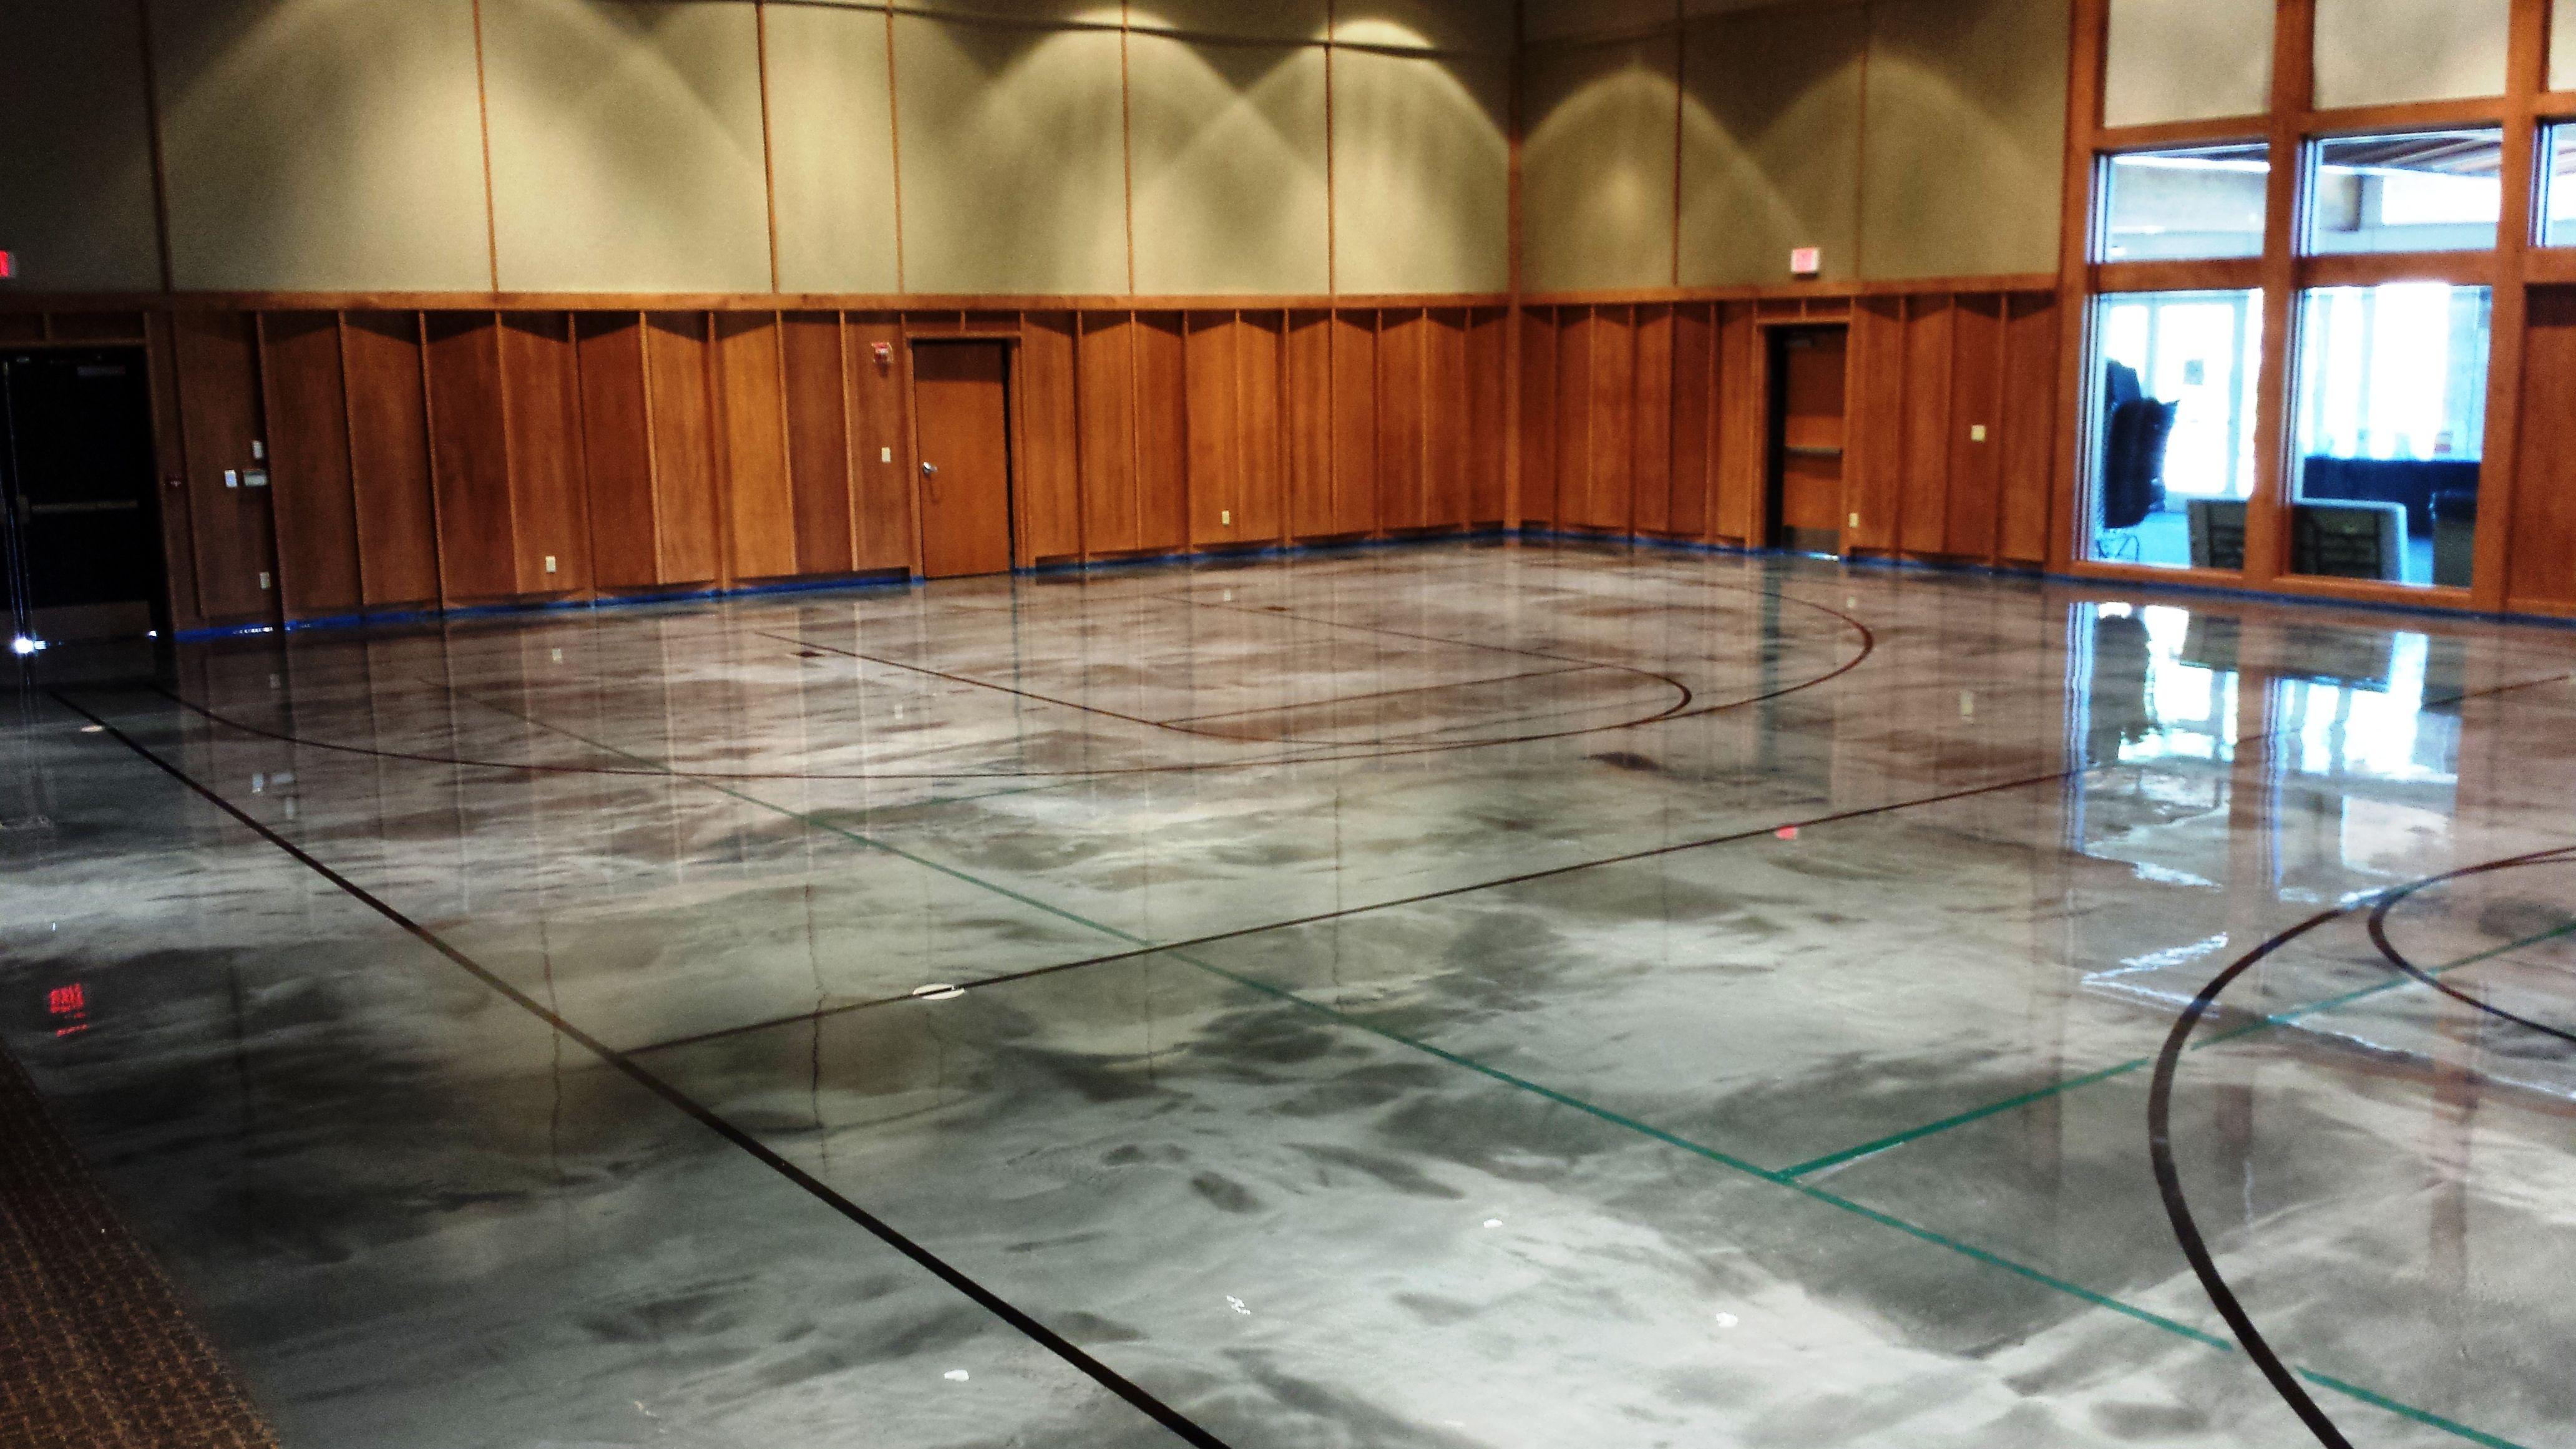 Elite Crete Reflector Epoxy Basketball Court Gets Custom Flooring